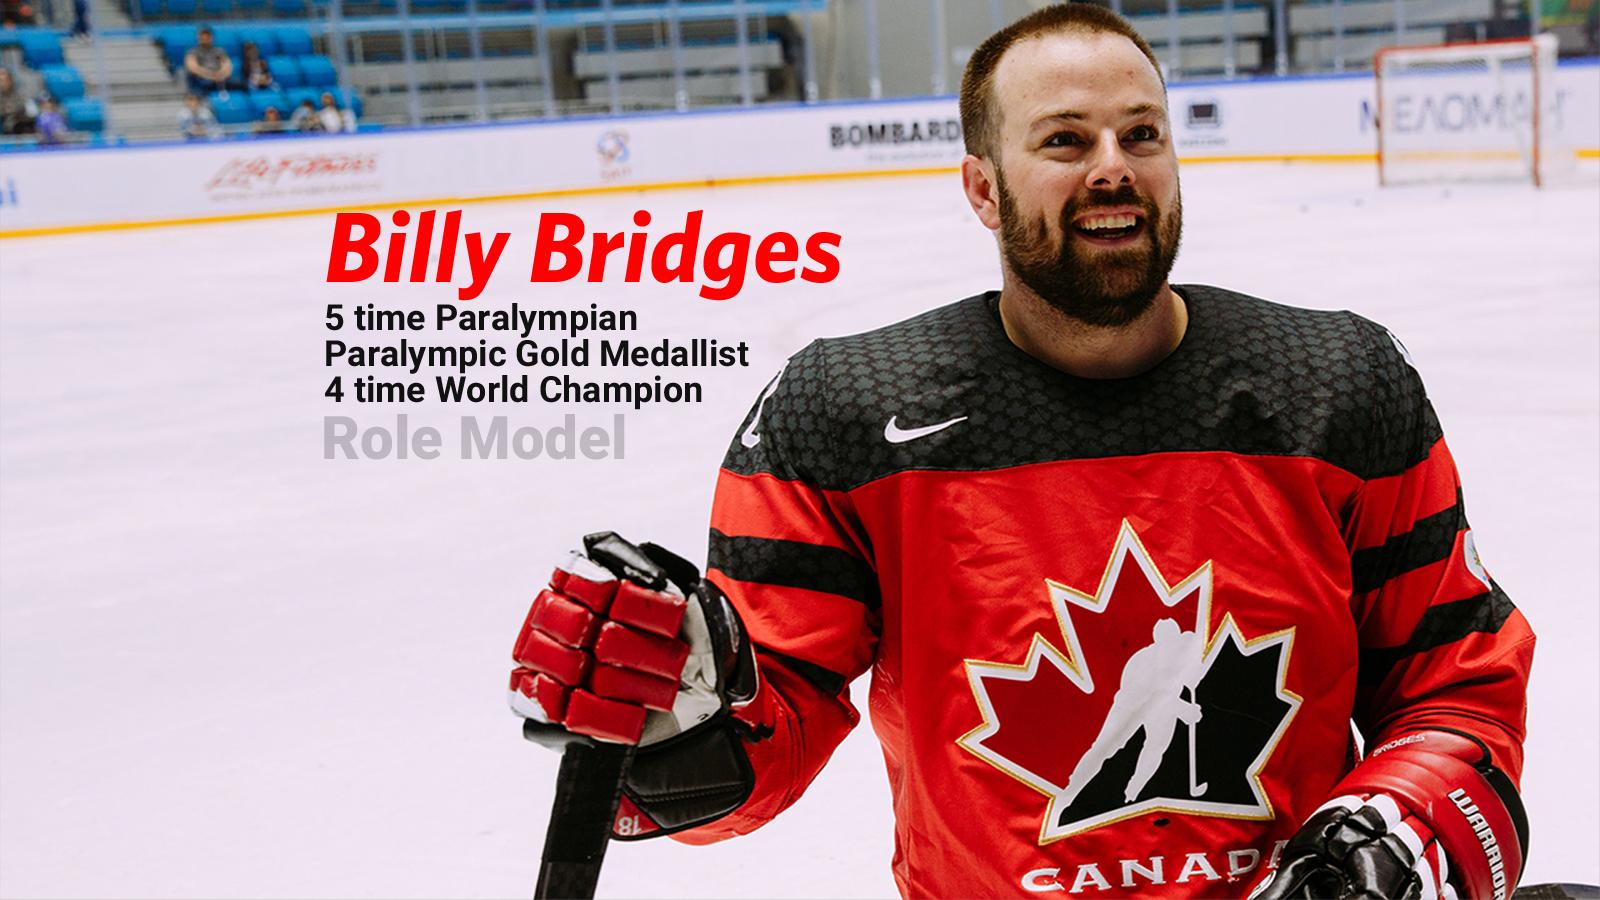 Billy Bridges